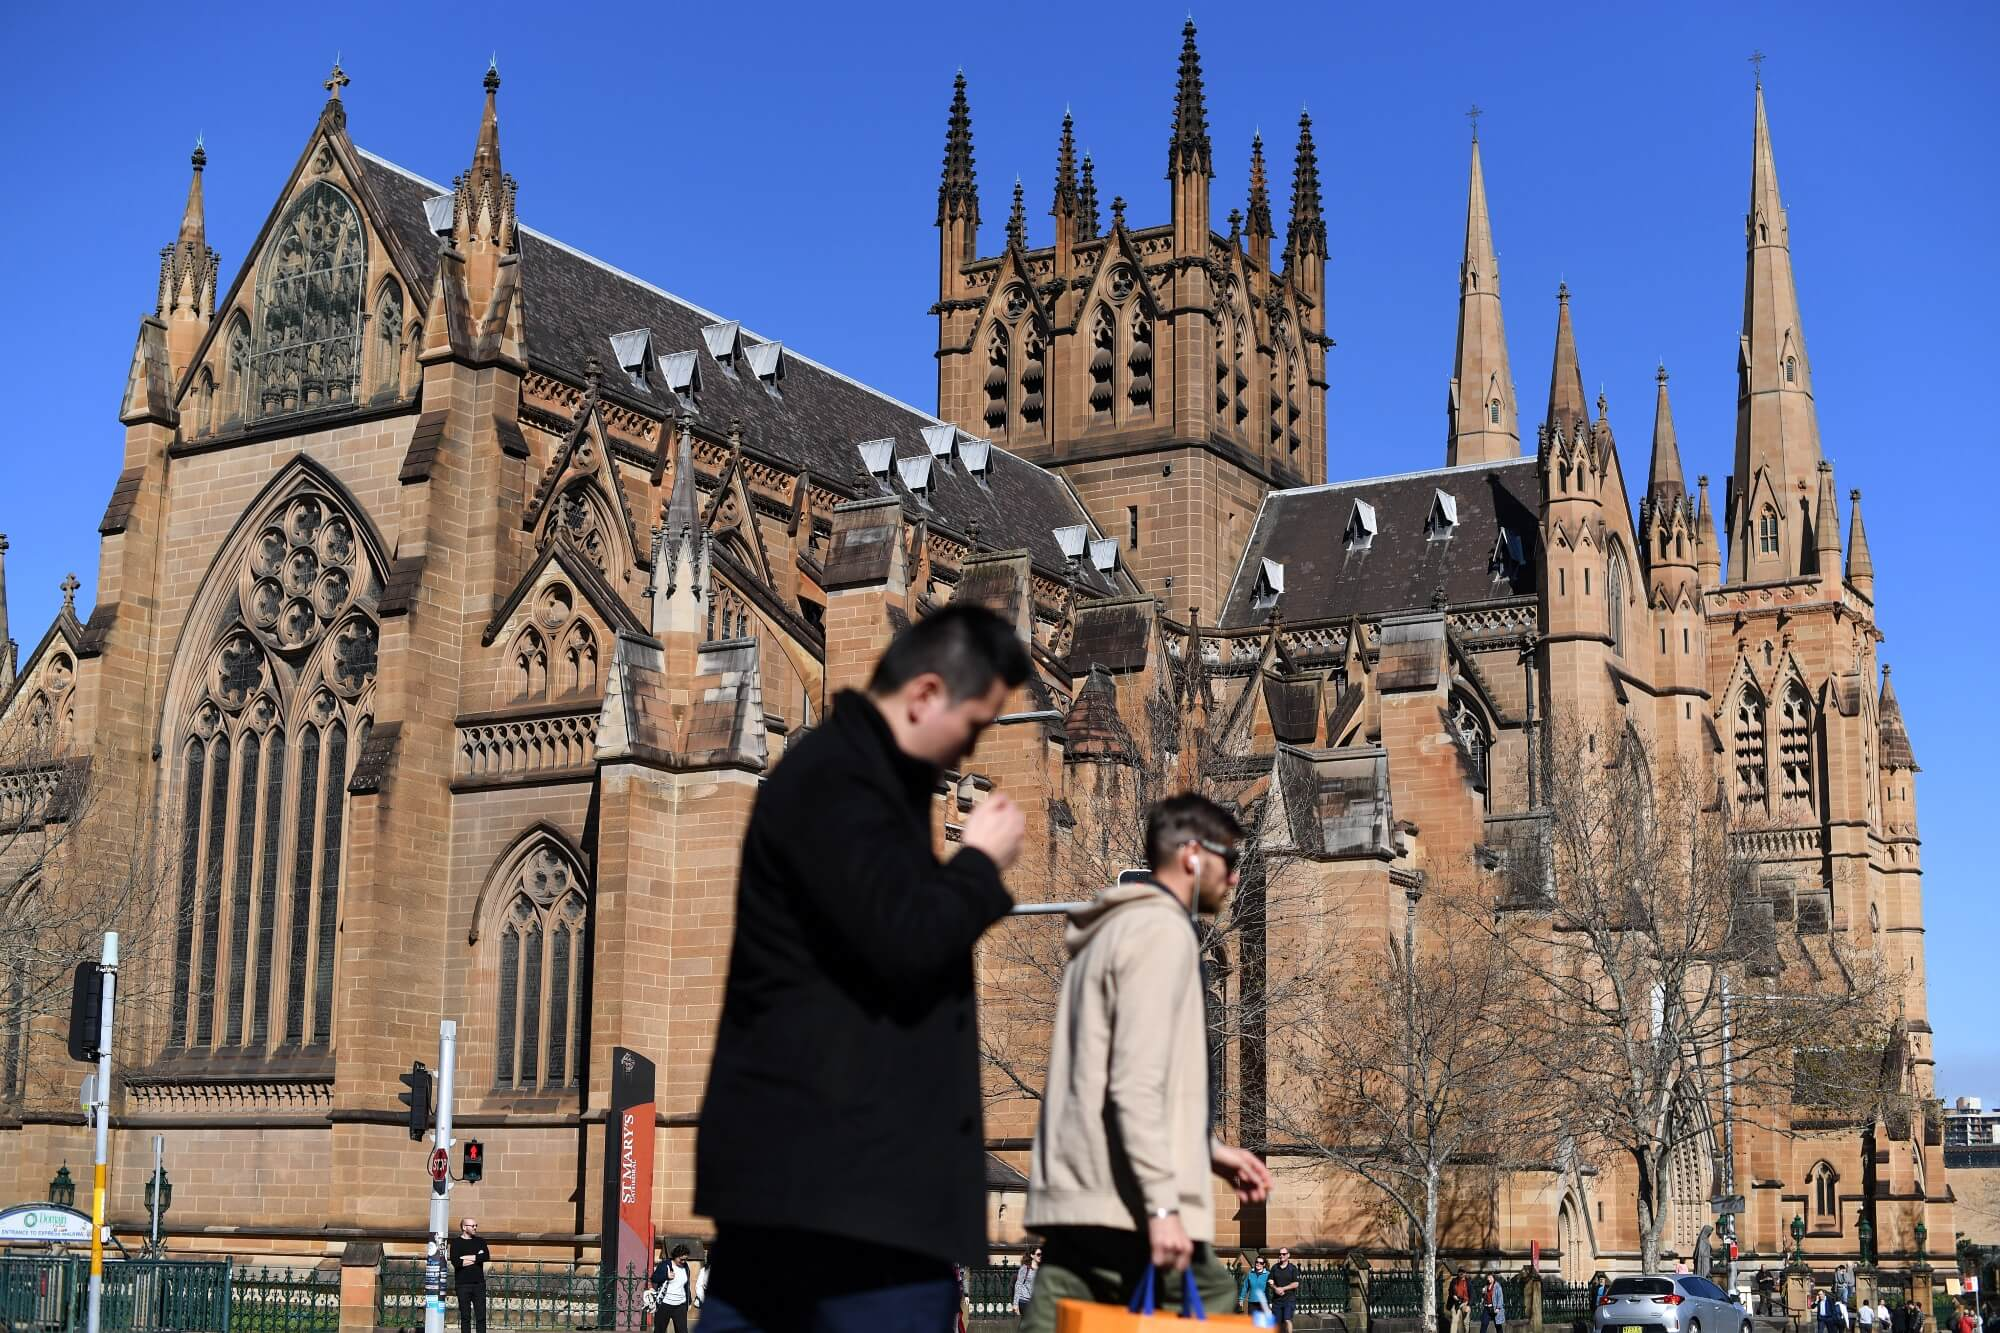 NSW Australia's international students